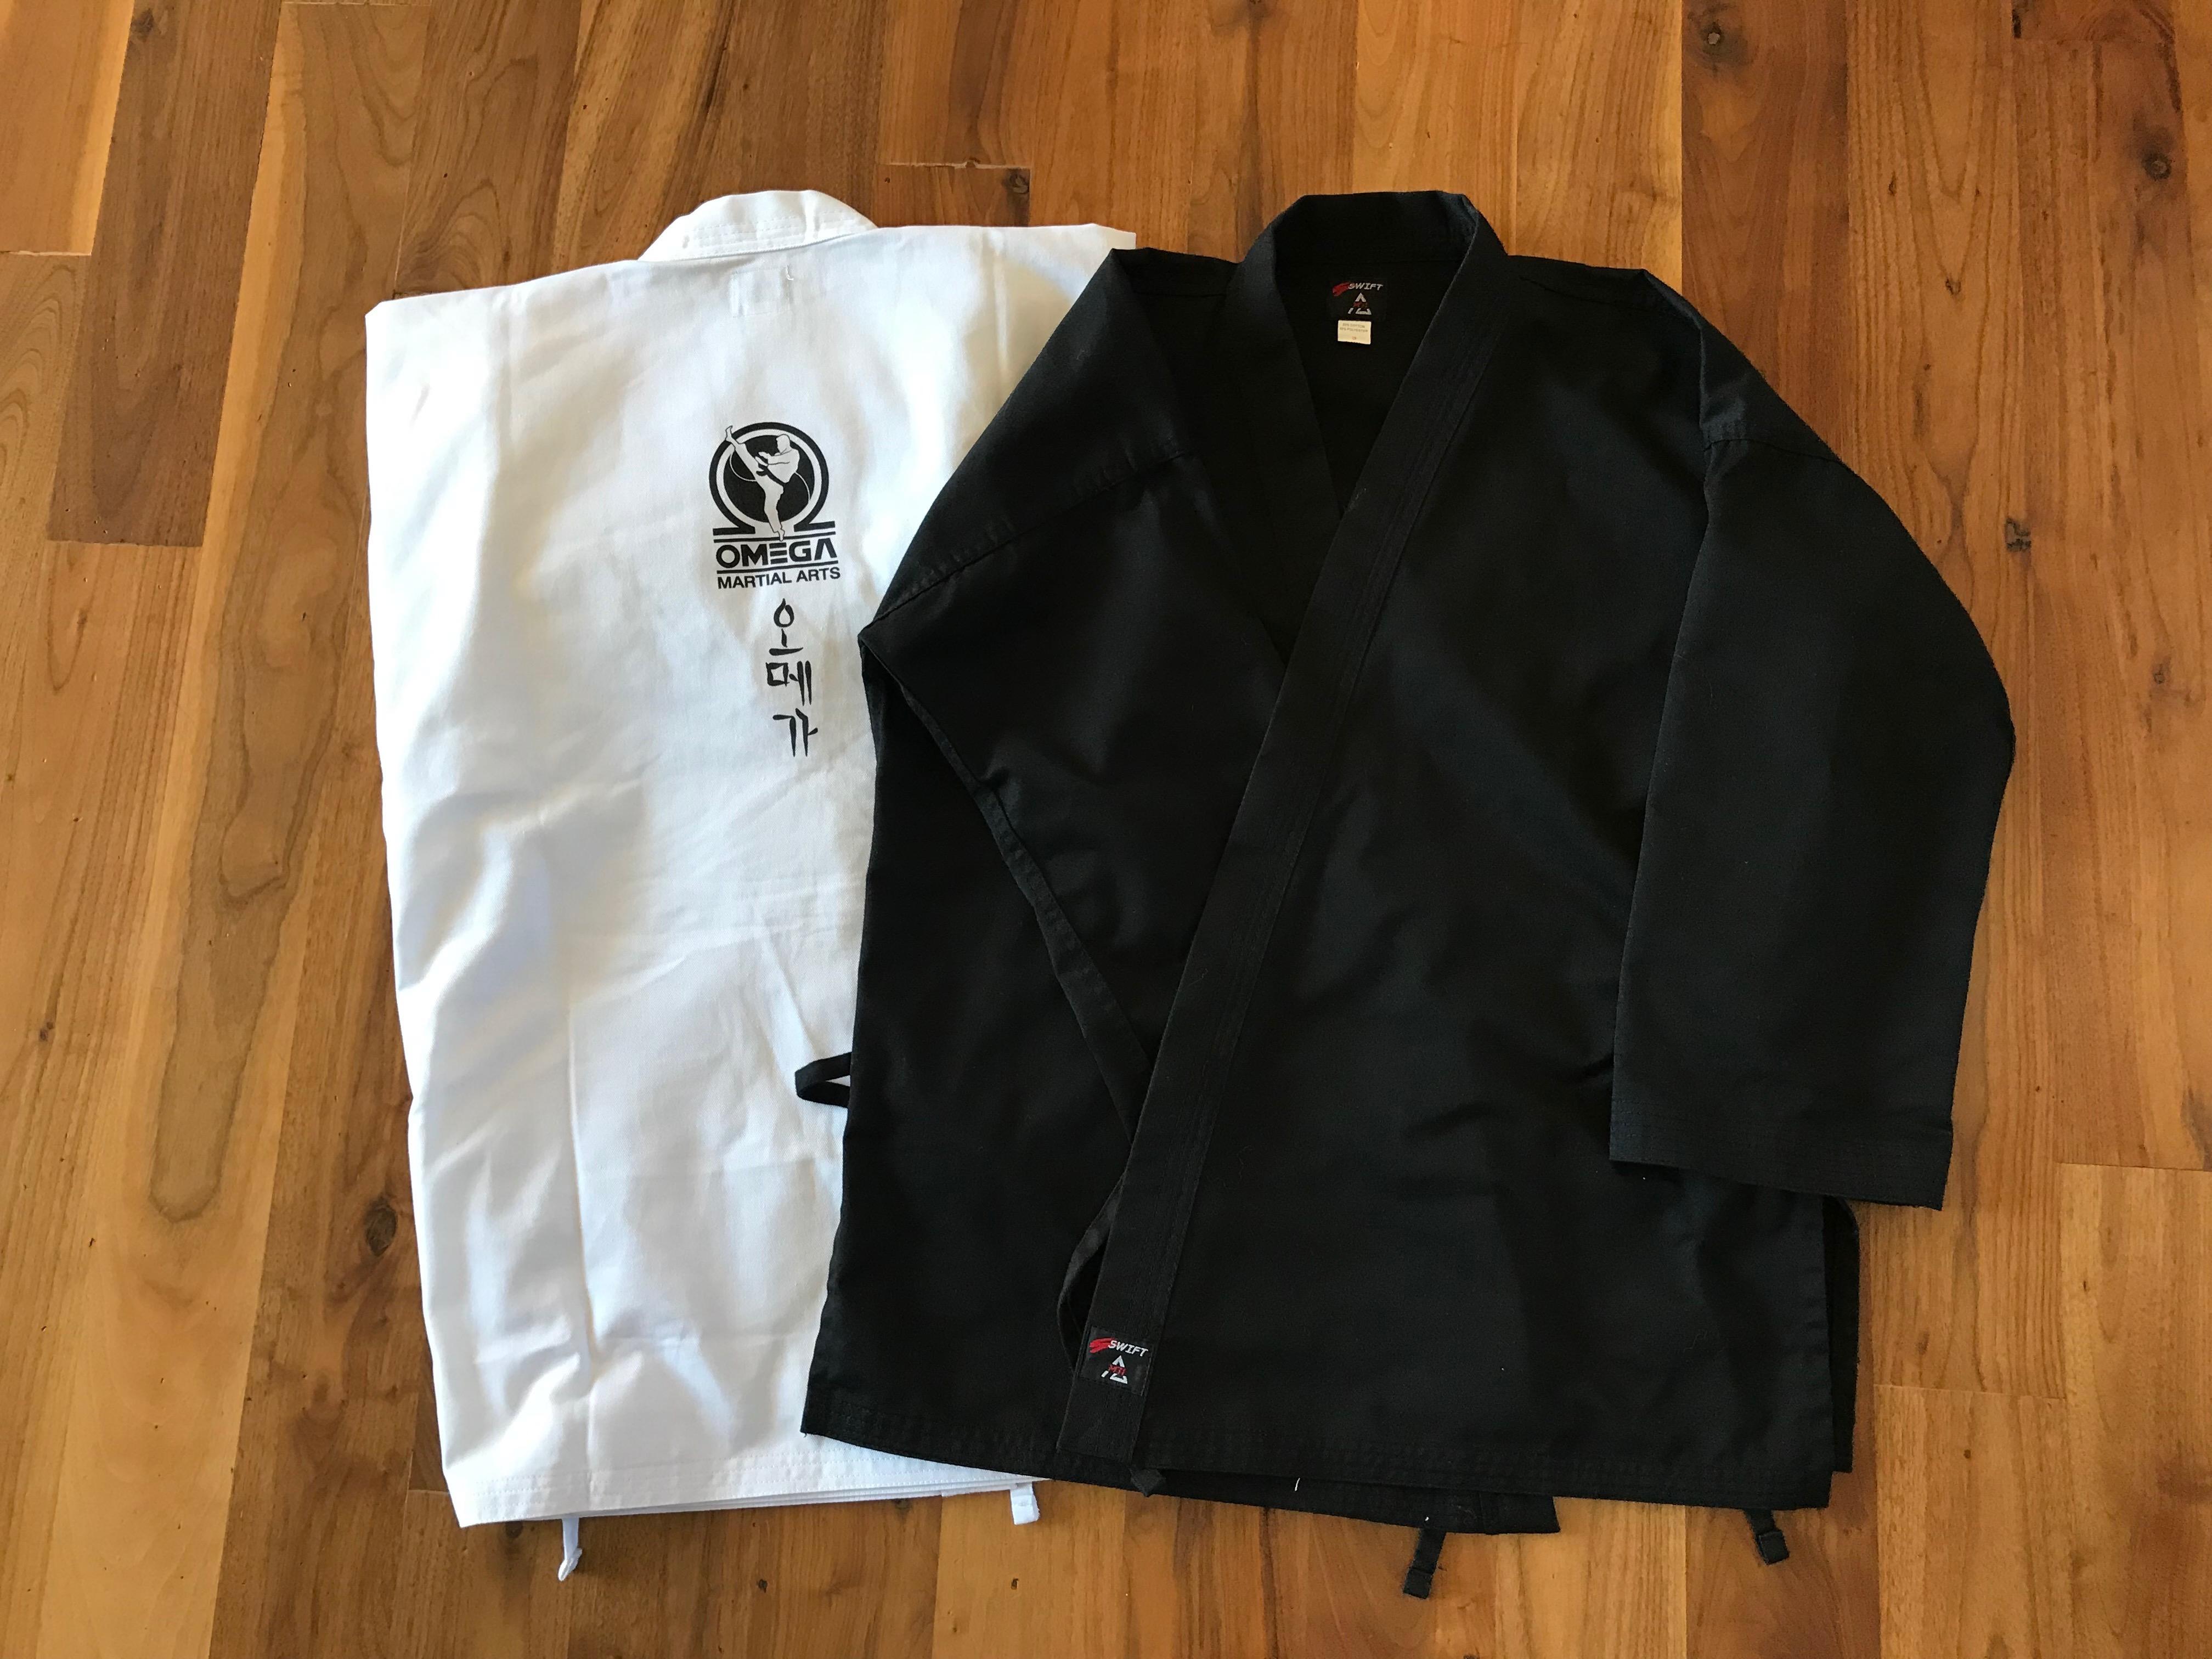 omega-uniforms